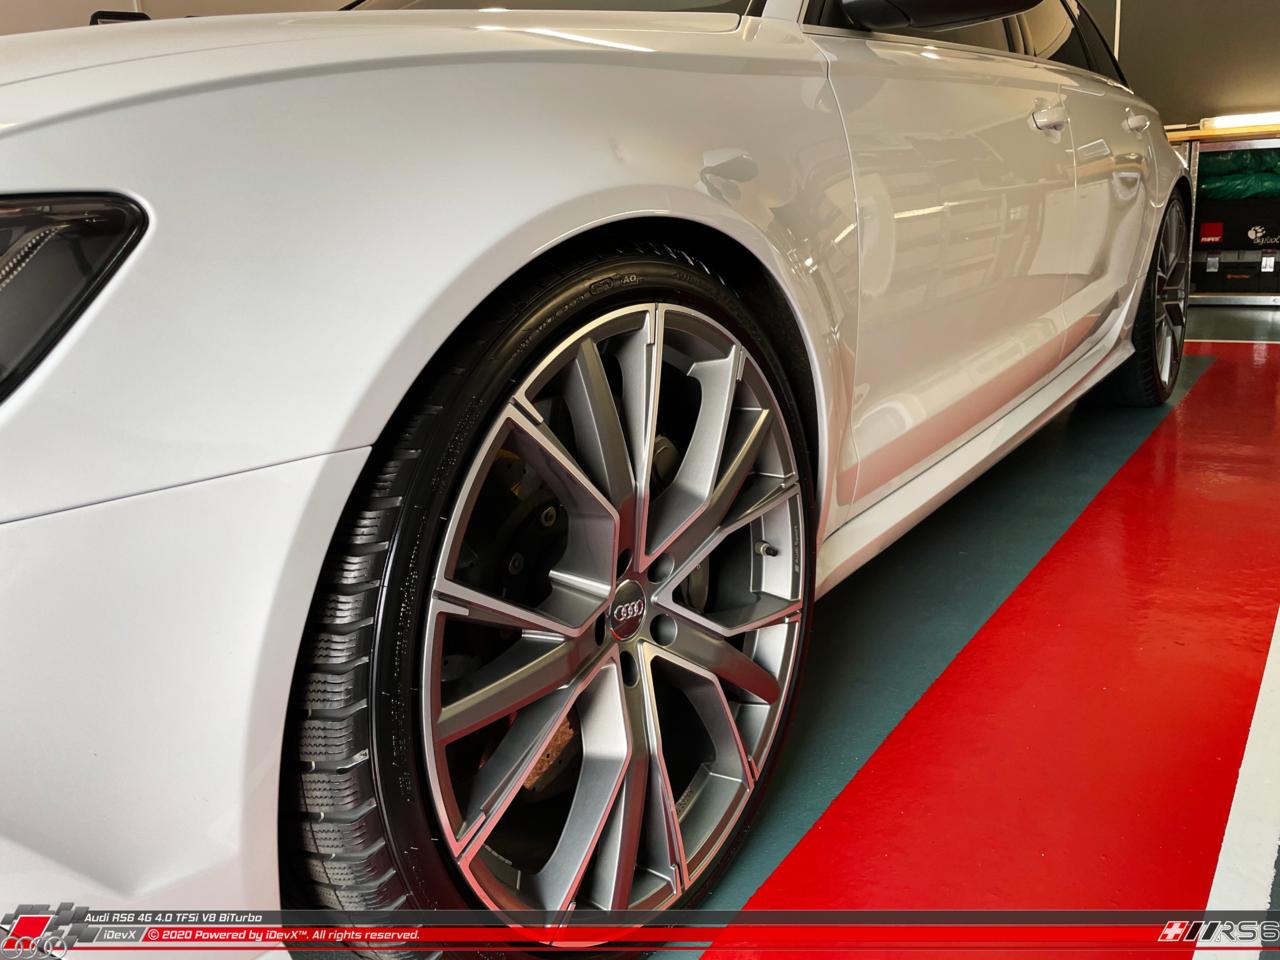 19.02.2021_Audi-RS6_iDevX_009.png